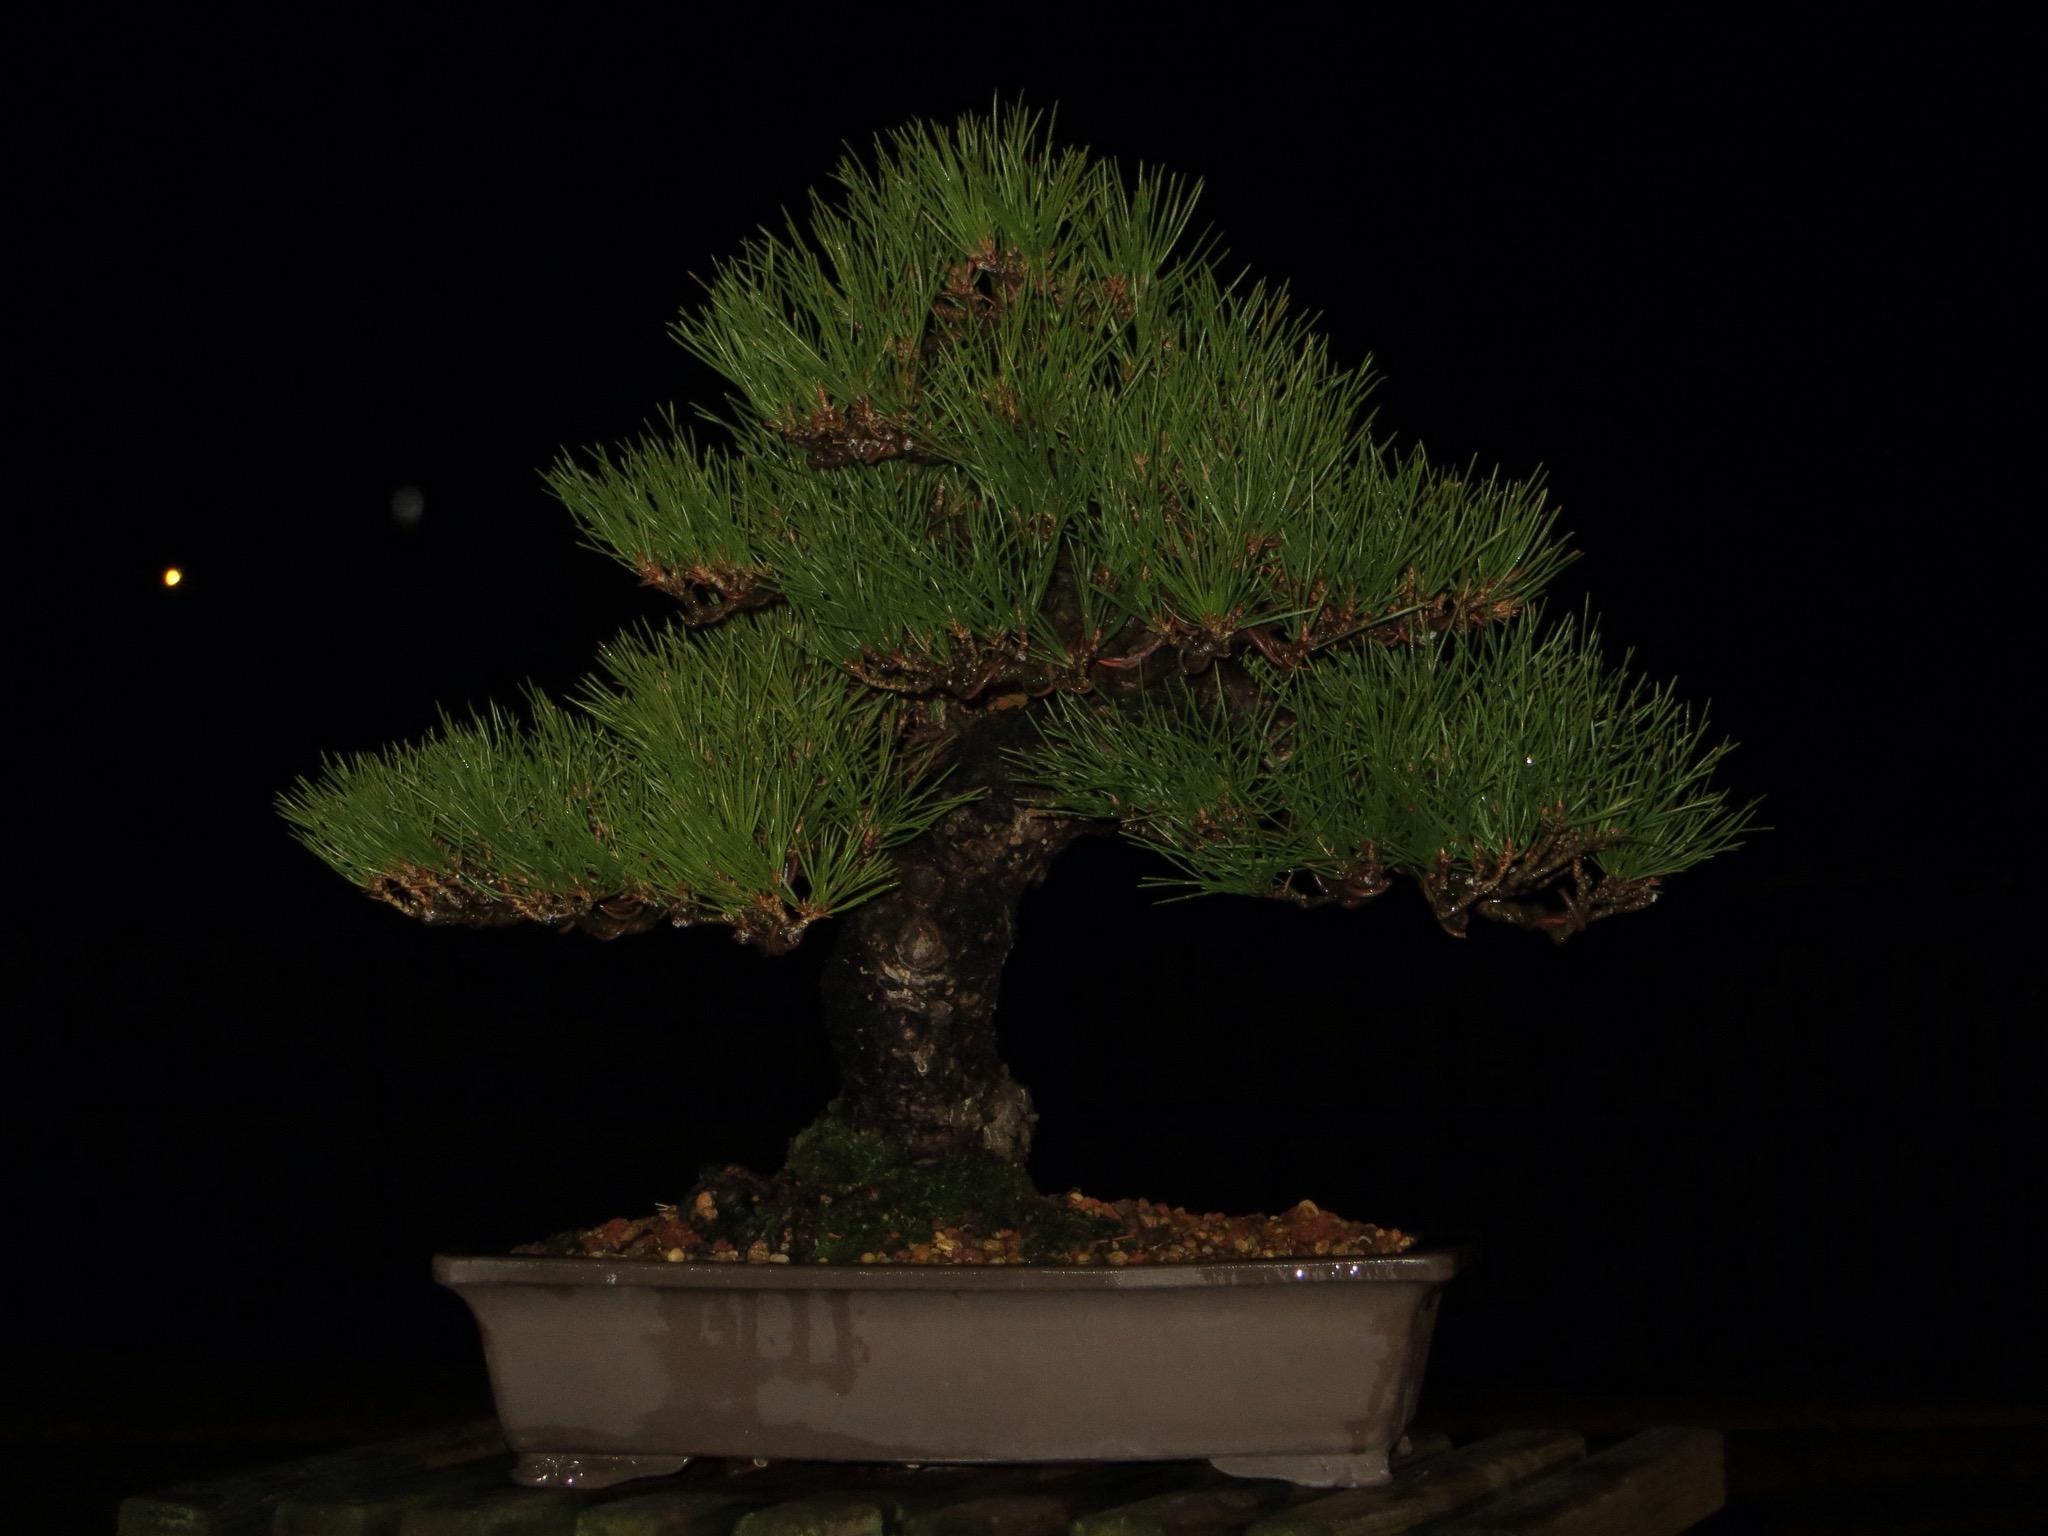 How I photograph bonsai